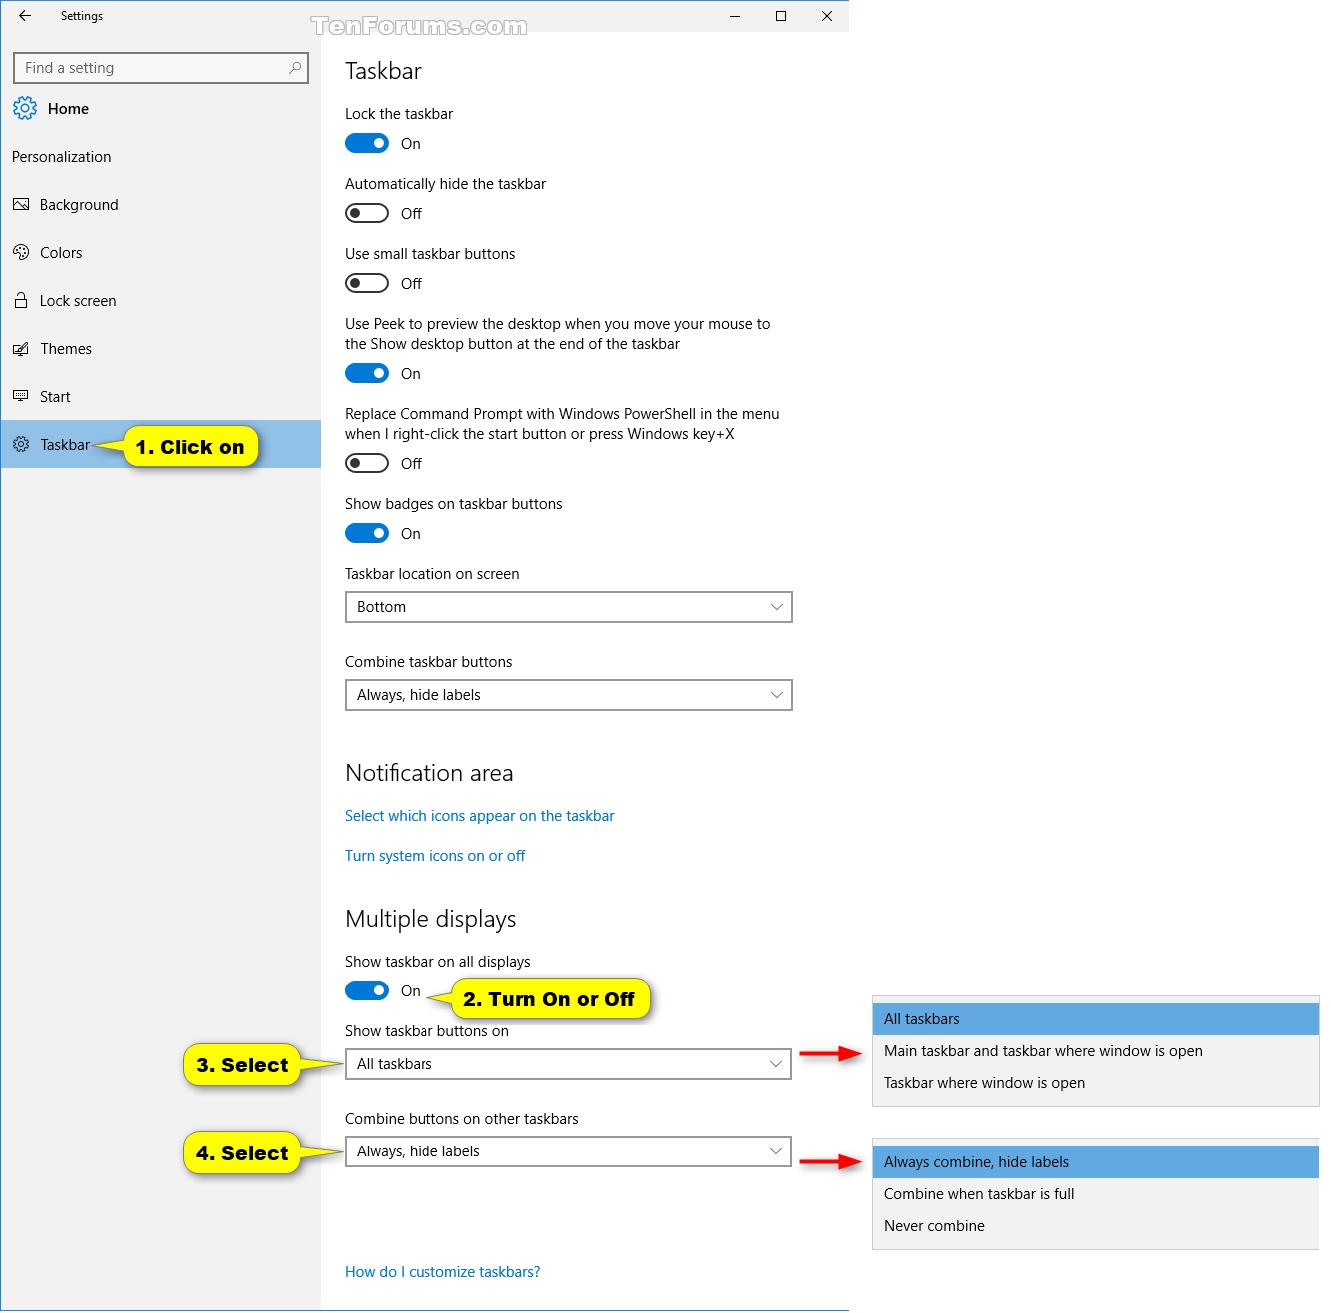 Hide Or Show Taskbar On Multiple Displays In Windows 10